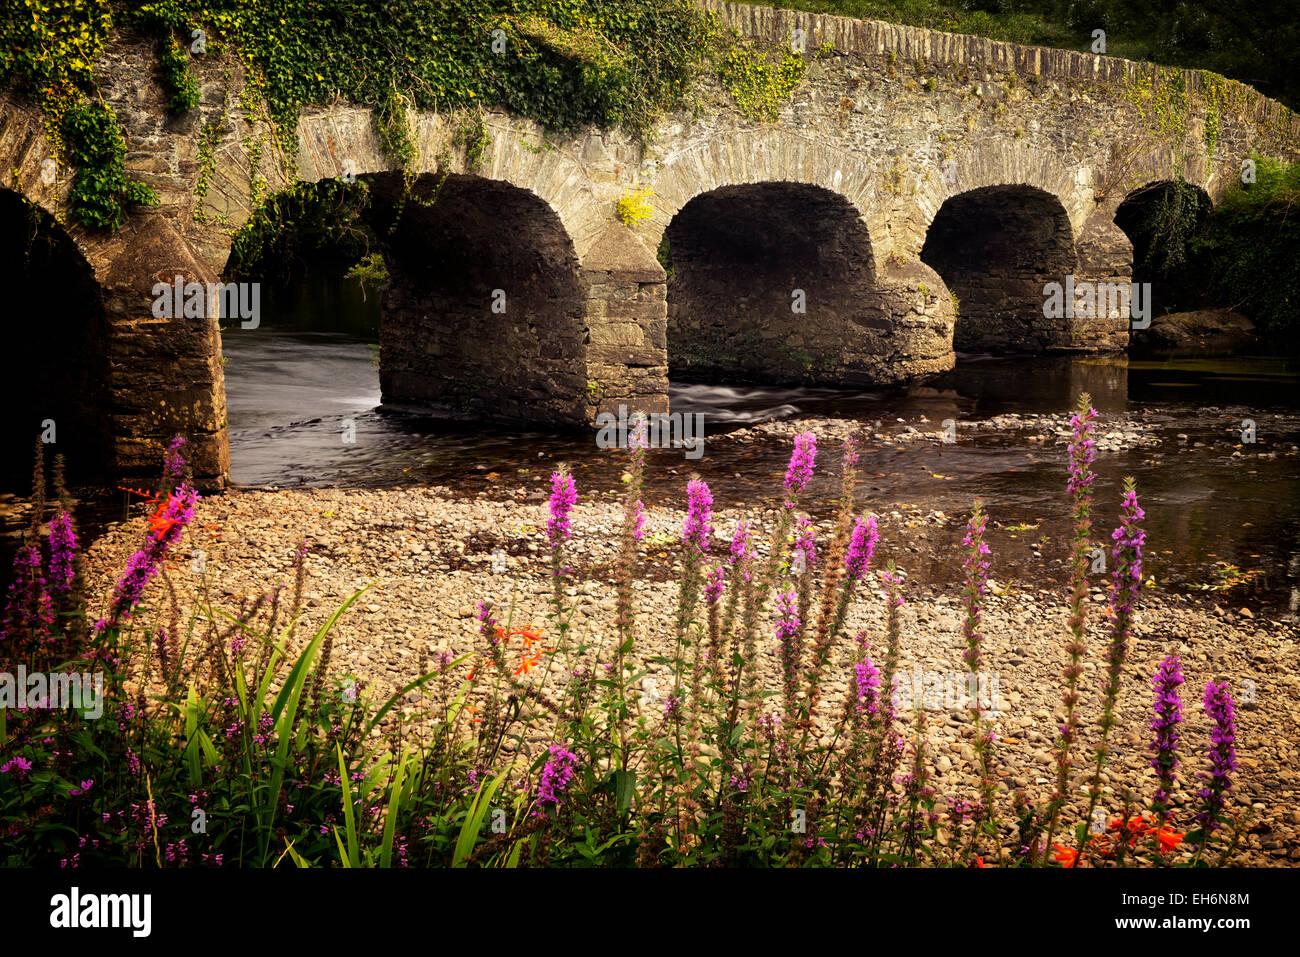 Bridge over Gearhmeen River with wildflowers, Killarney National Park, Ireland - Stock Image